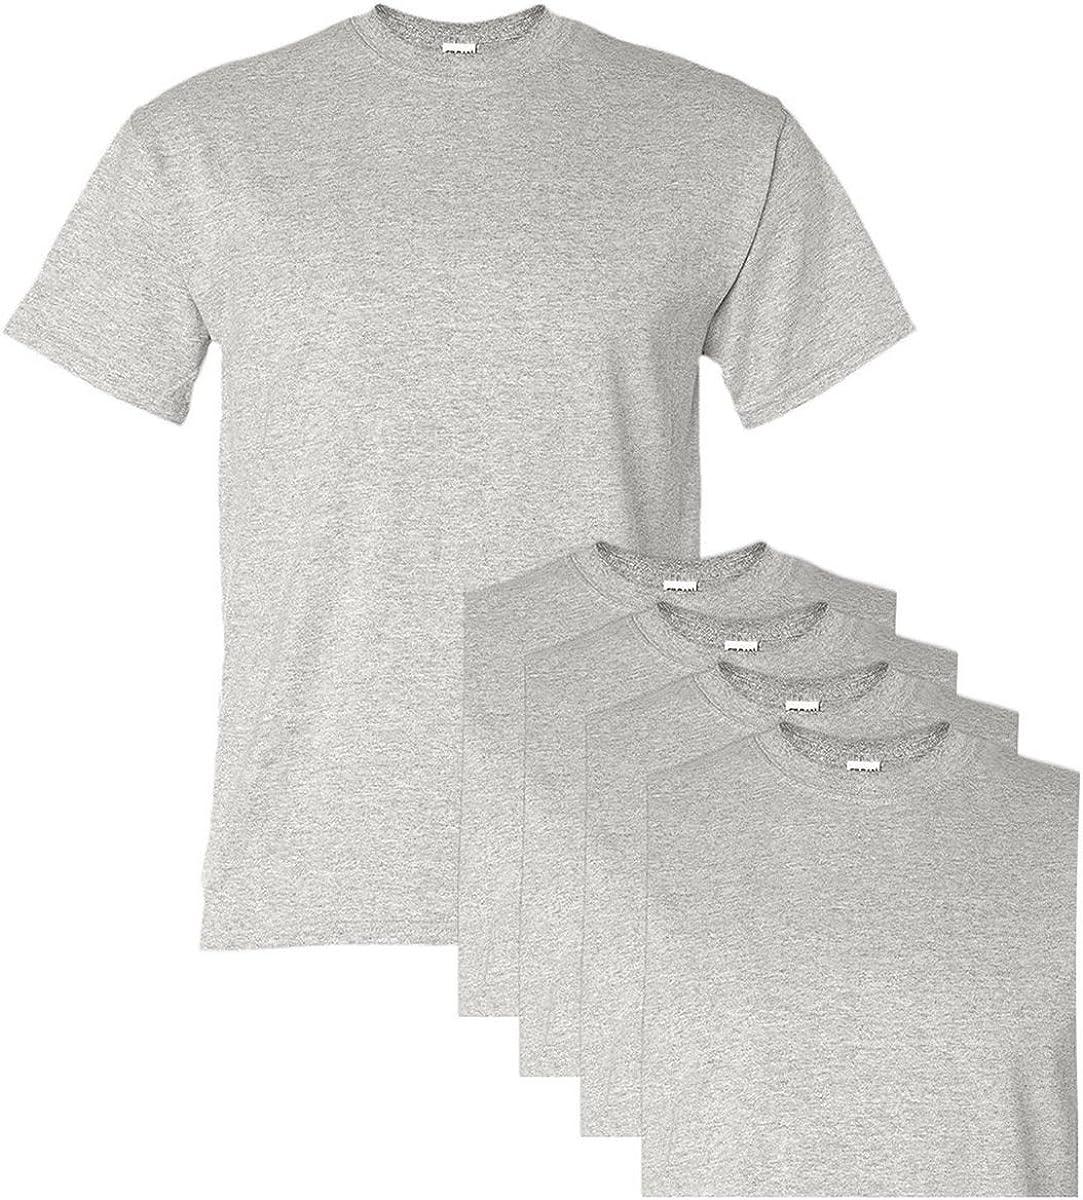 Gildan Adult DryBlend Sports T-Shirt, Ash, L (Pack of 5)